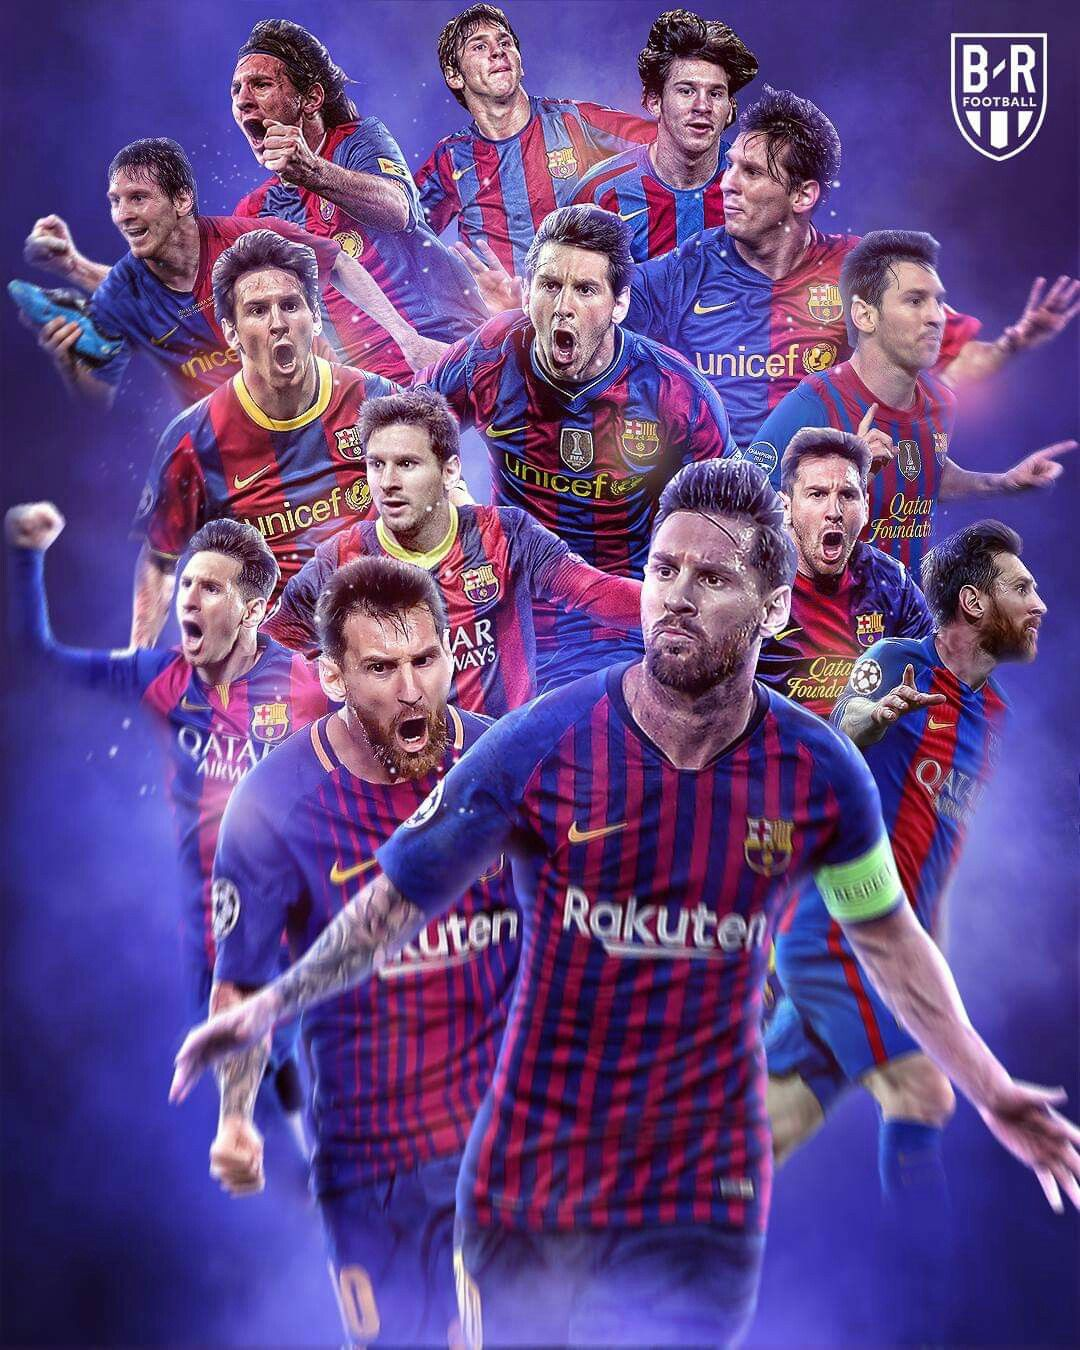 All Messi Versions Fotos De Messi Fotos De Lionel Messi Fútbol De Barcelona